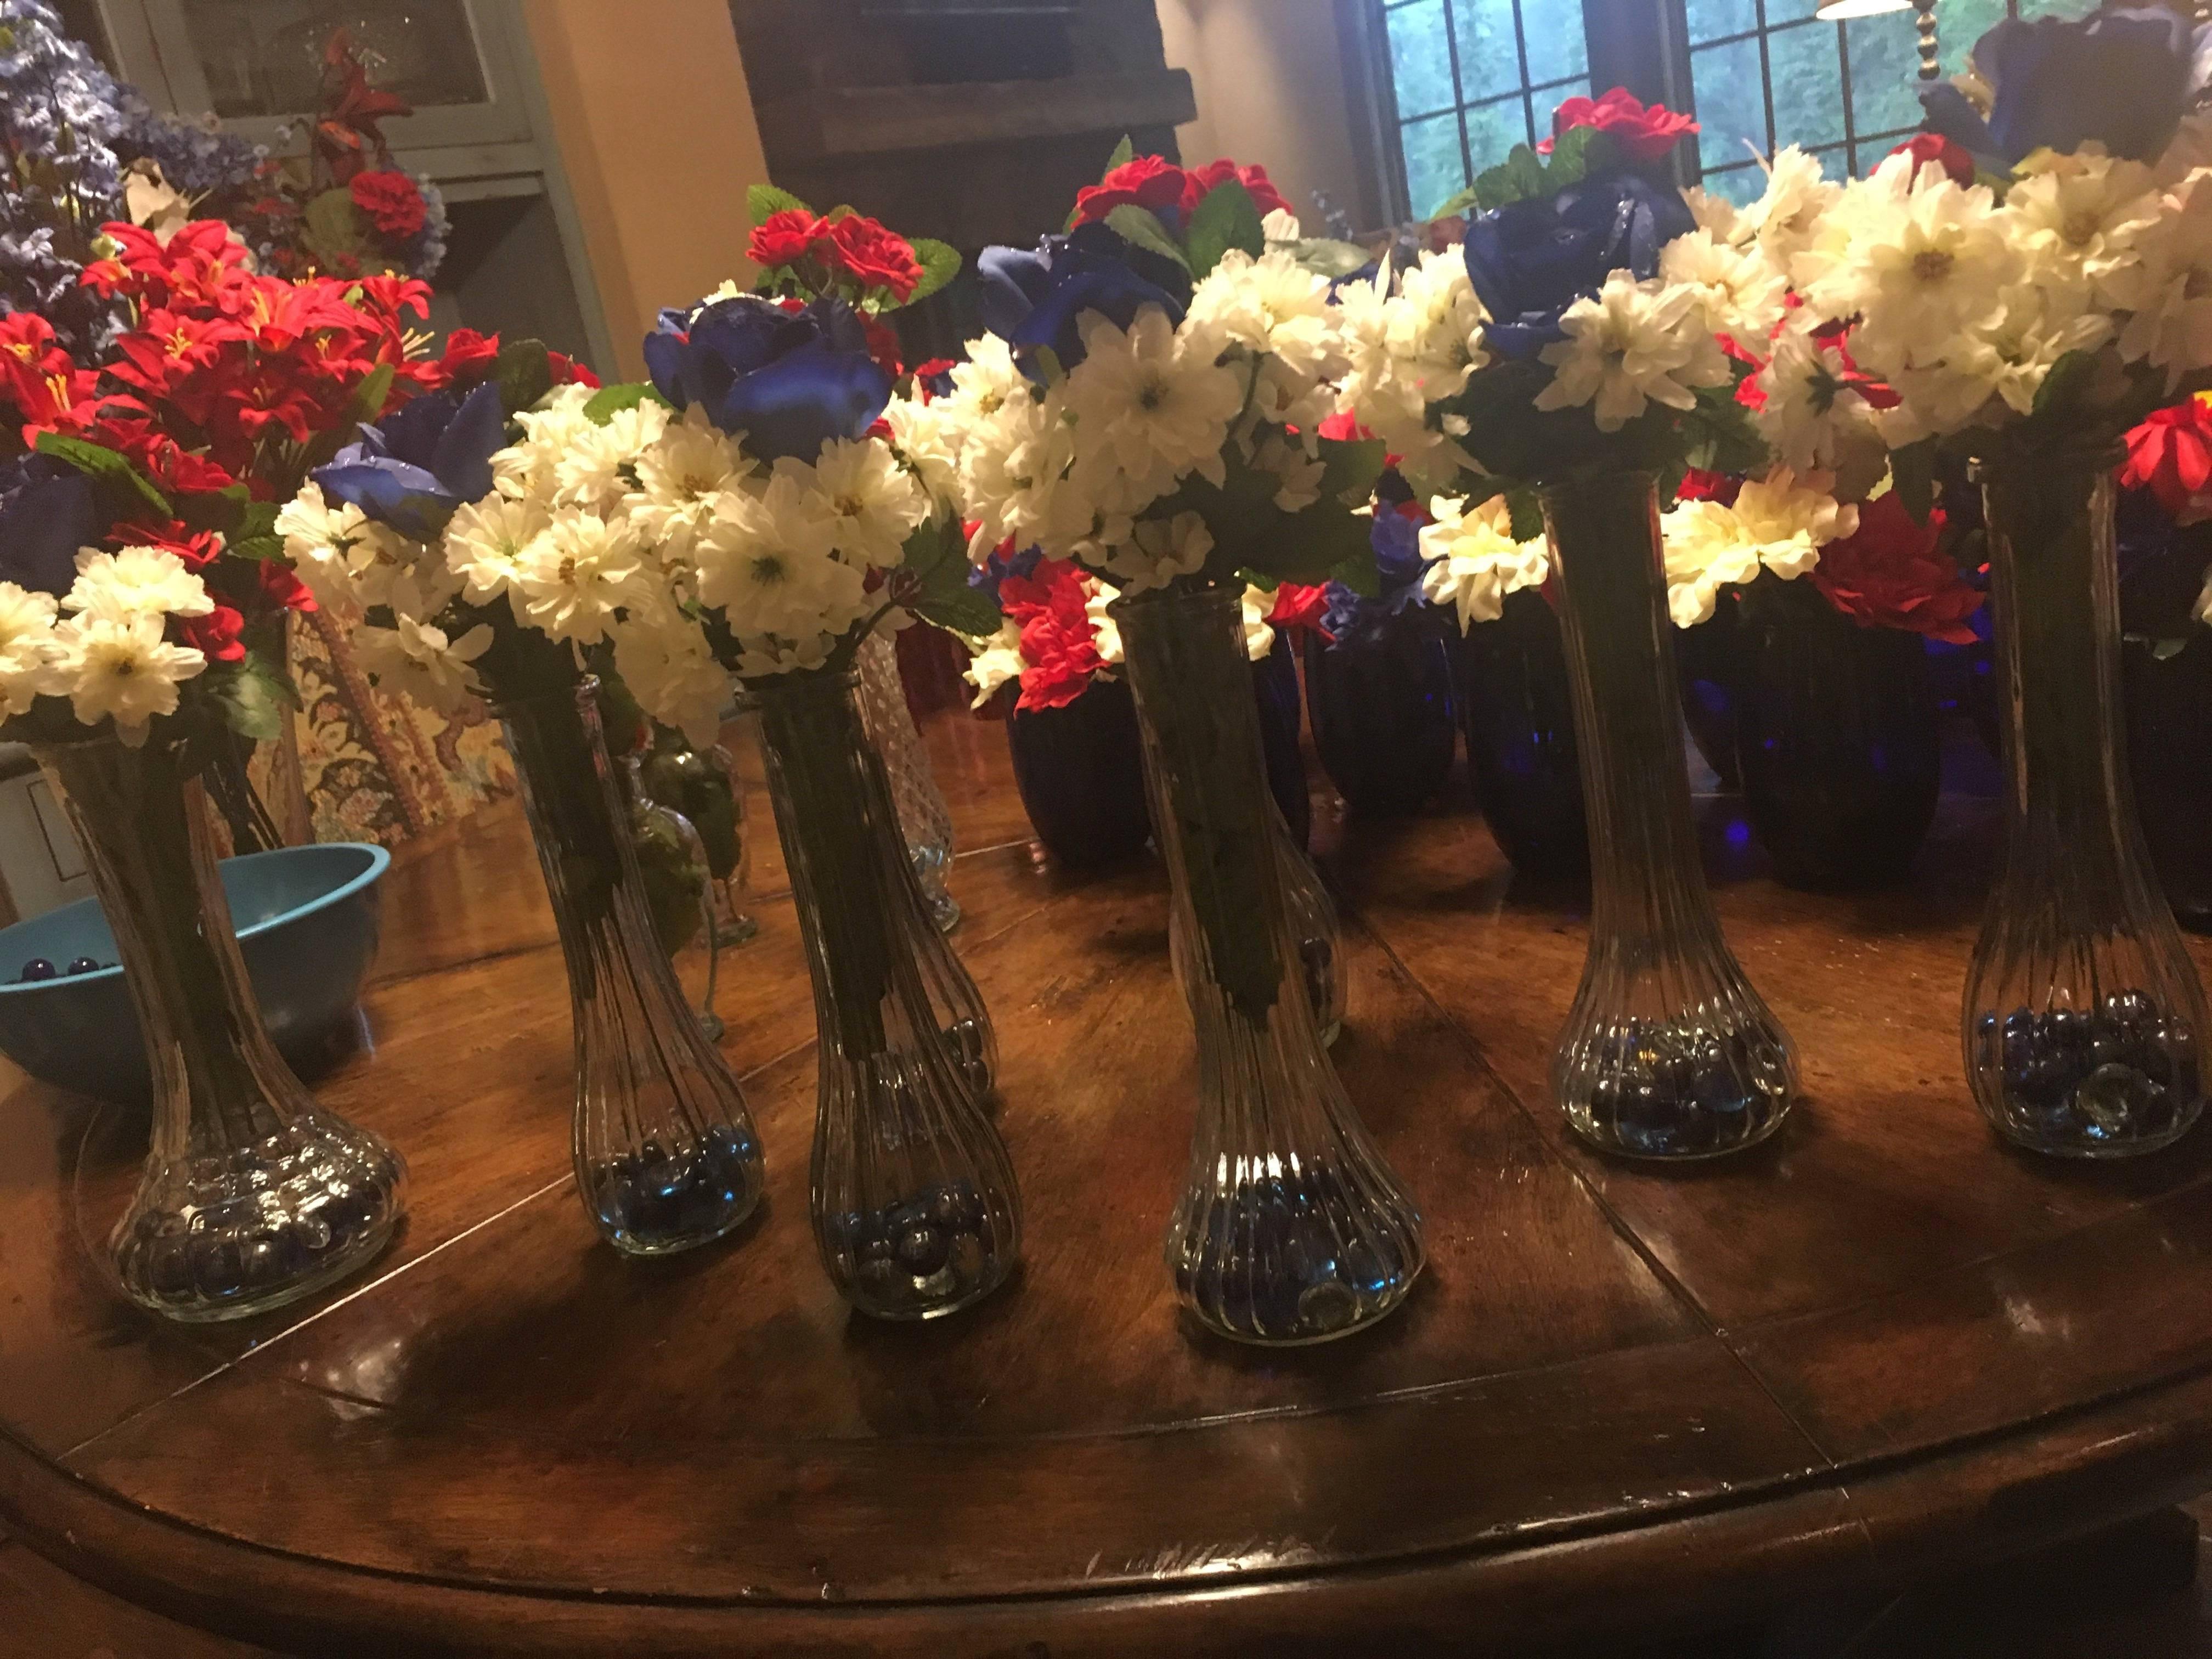 24 Nice Trumpet Vases for Sale 2021 free download trumpet vases for sale of gold centerpieces for wedding greatest gold wedding centerpieces for gold centerpieces for wedding greatest gold wedding centerpieces luxury vases disposable plasti